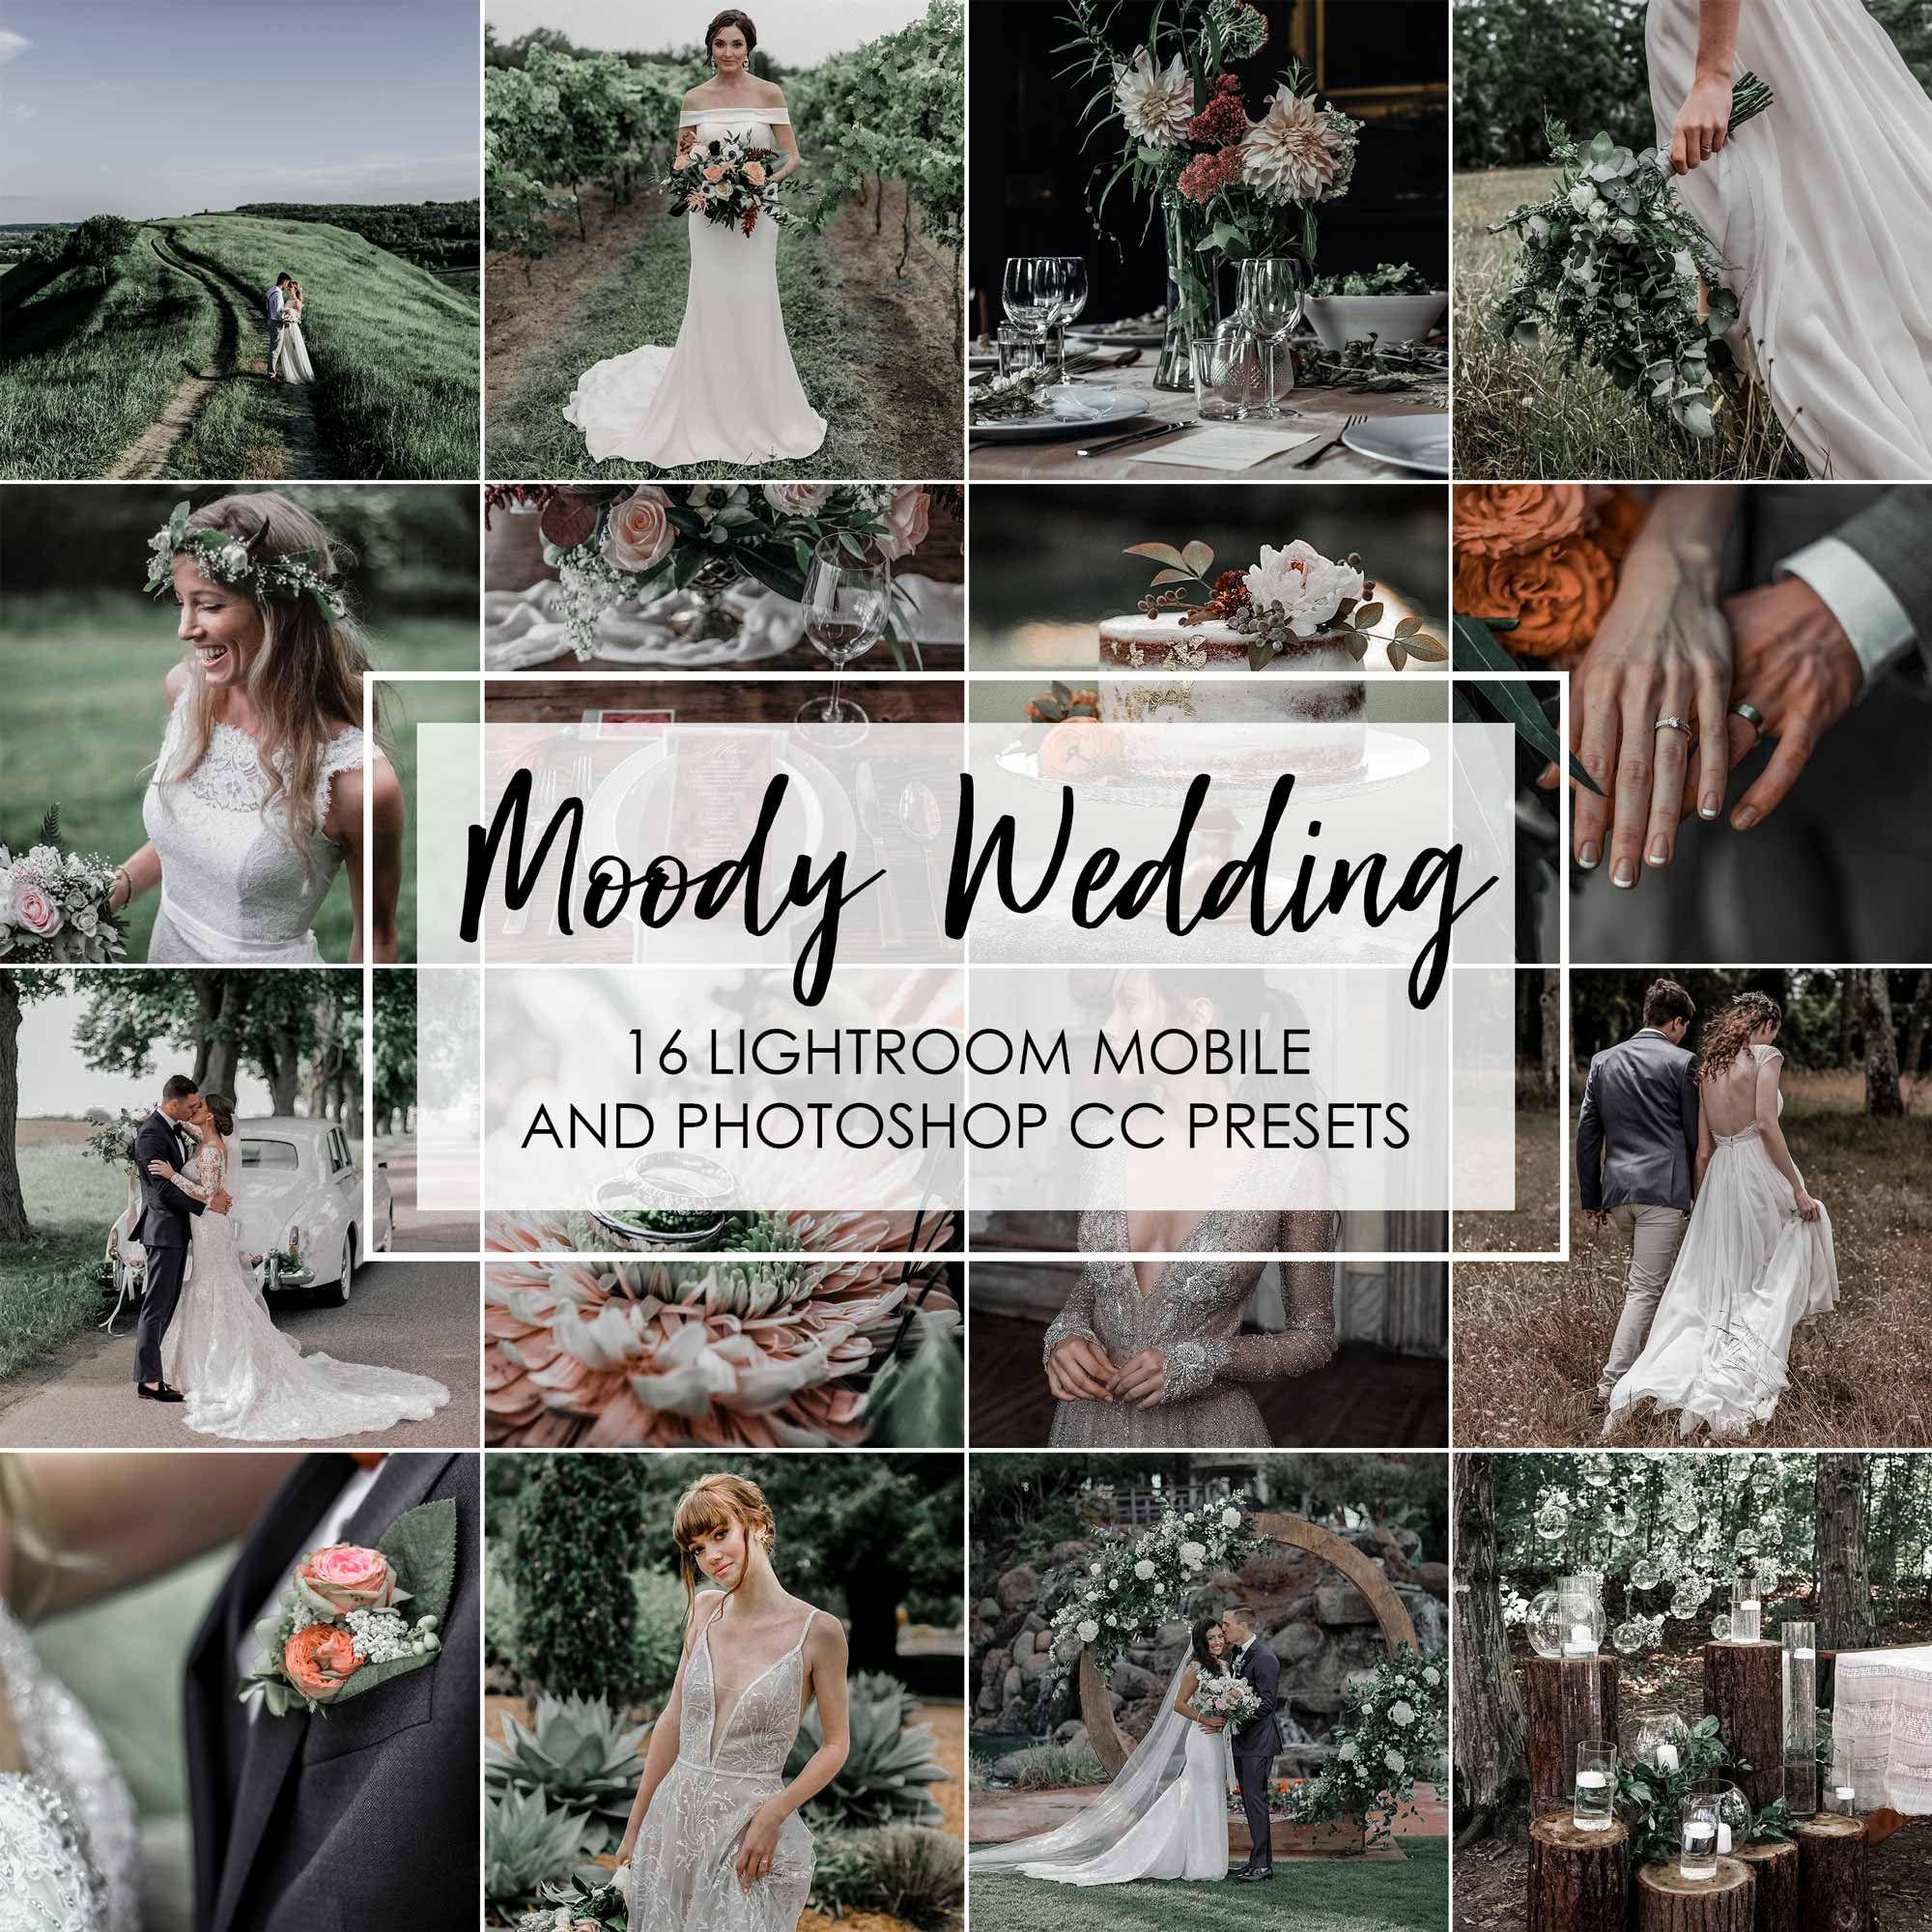 Lightroom Presets 16 Presets Moody Wedding Wedding Presets Moody Presets Bride Presets Wedding Lightroom Presets Dark Moody Presets In 2020 Wedding Presets Lightroom Moody Wedding